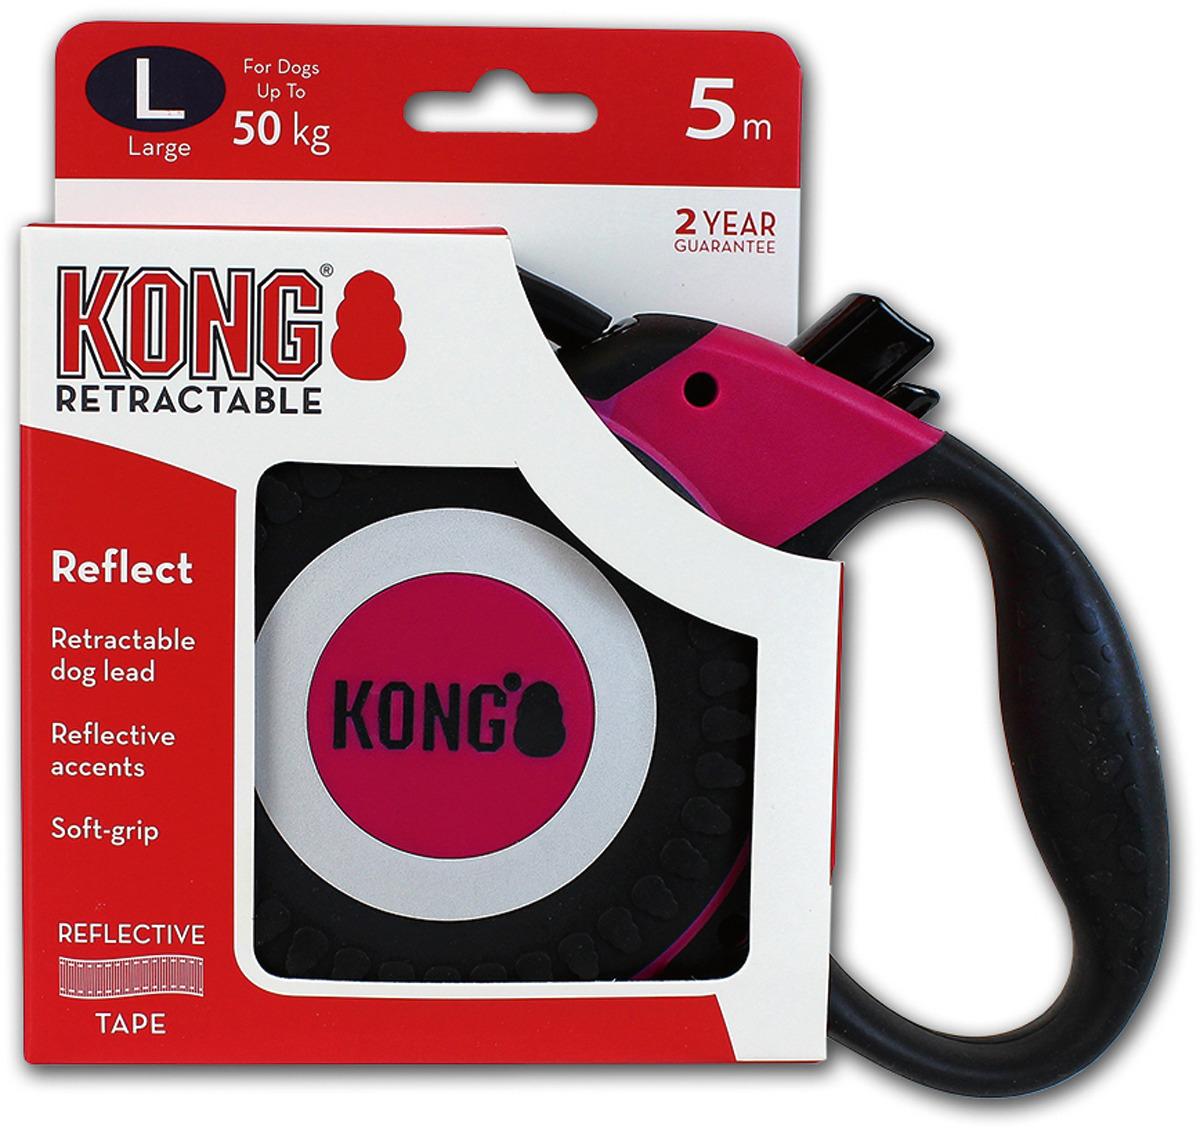 Поводок-рулетка для собак Kong Reflect L, цвет: фуксия, до 50 кг, 5 м